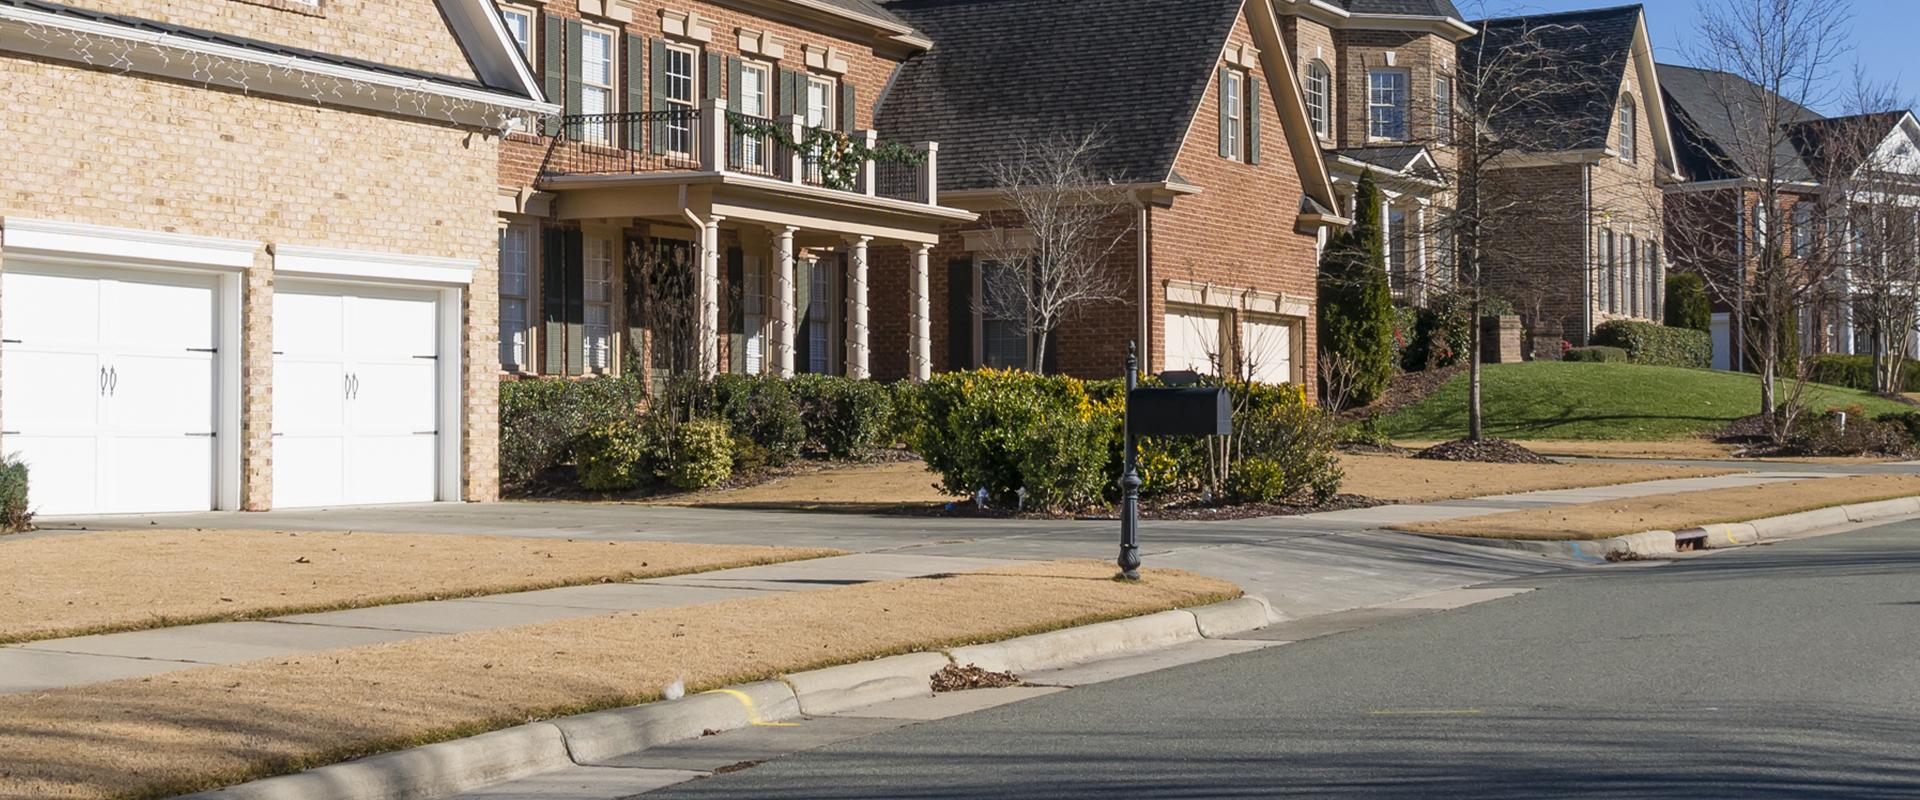 a suburban neighborhood